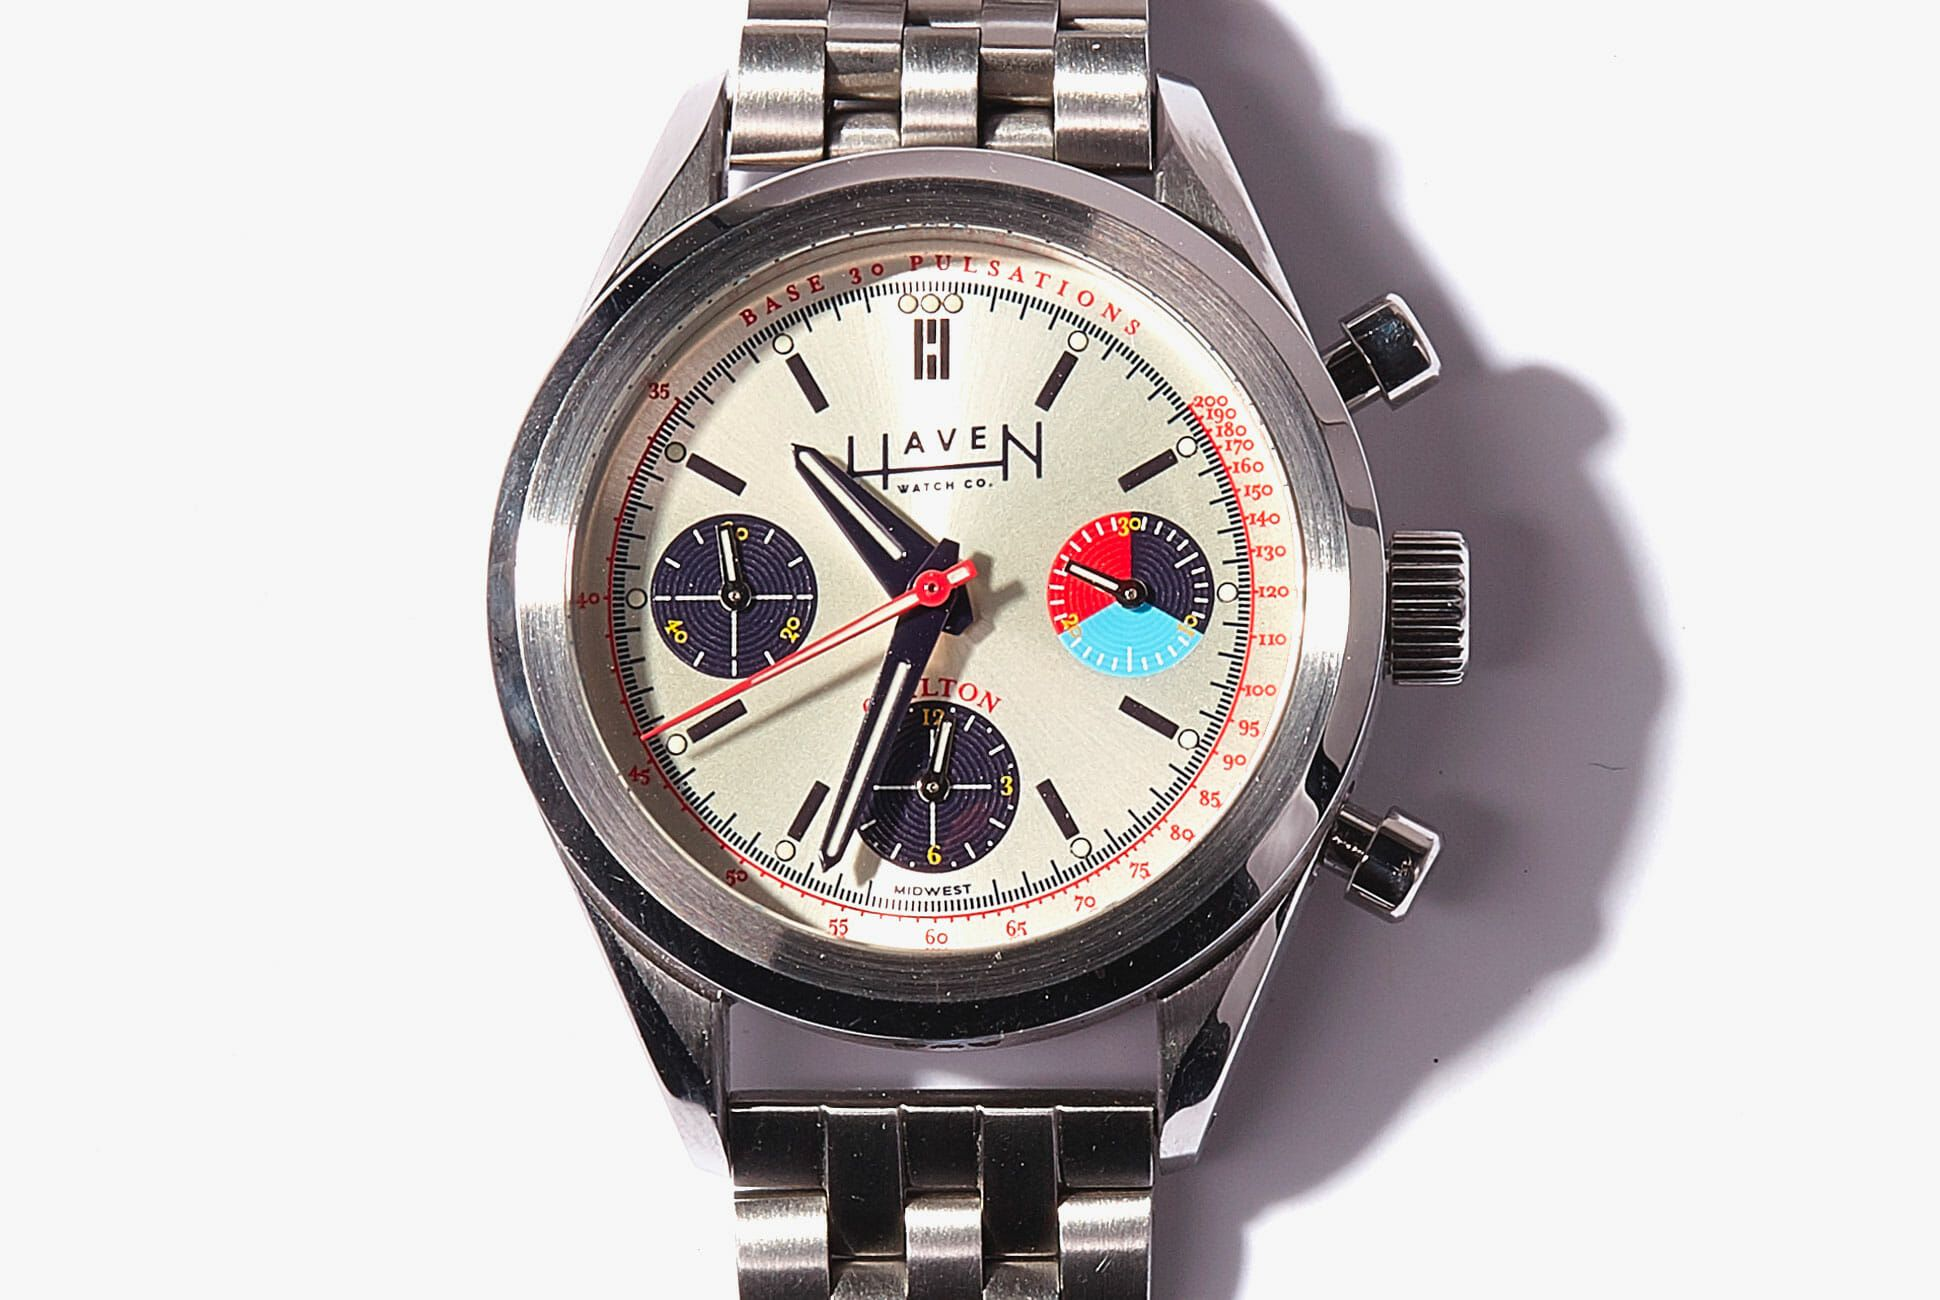 Haven-Watch-Co-Chilton-Chronograph-gear-patrol-slide-3